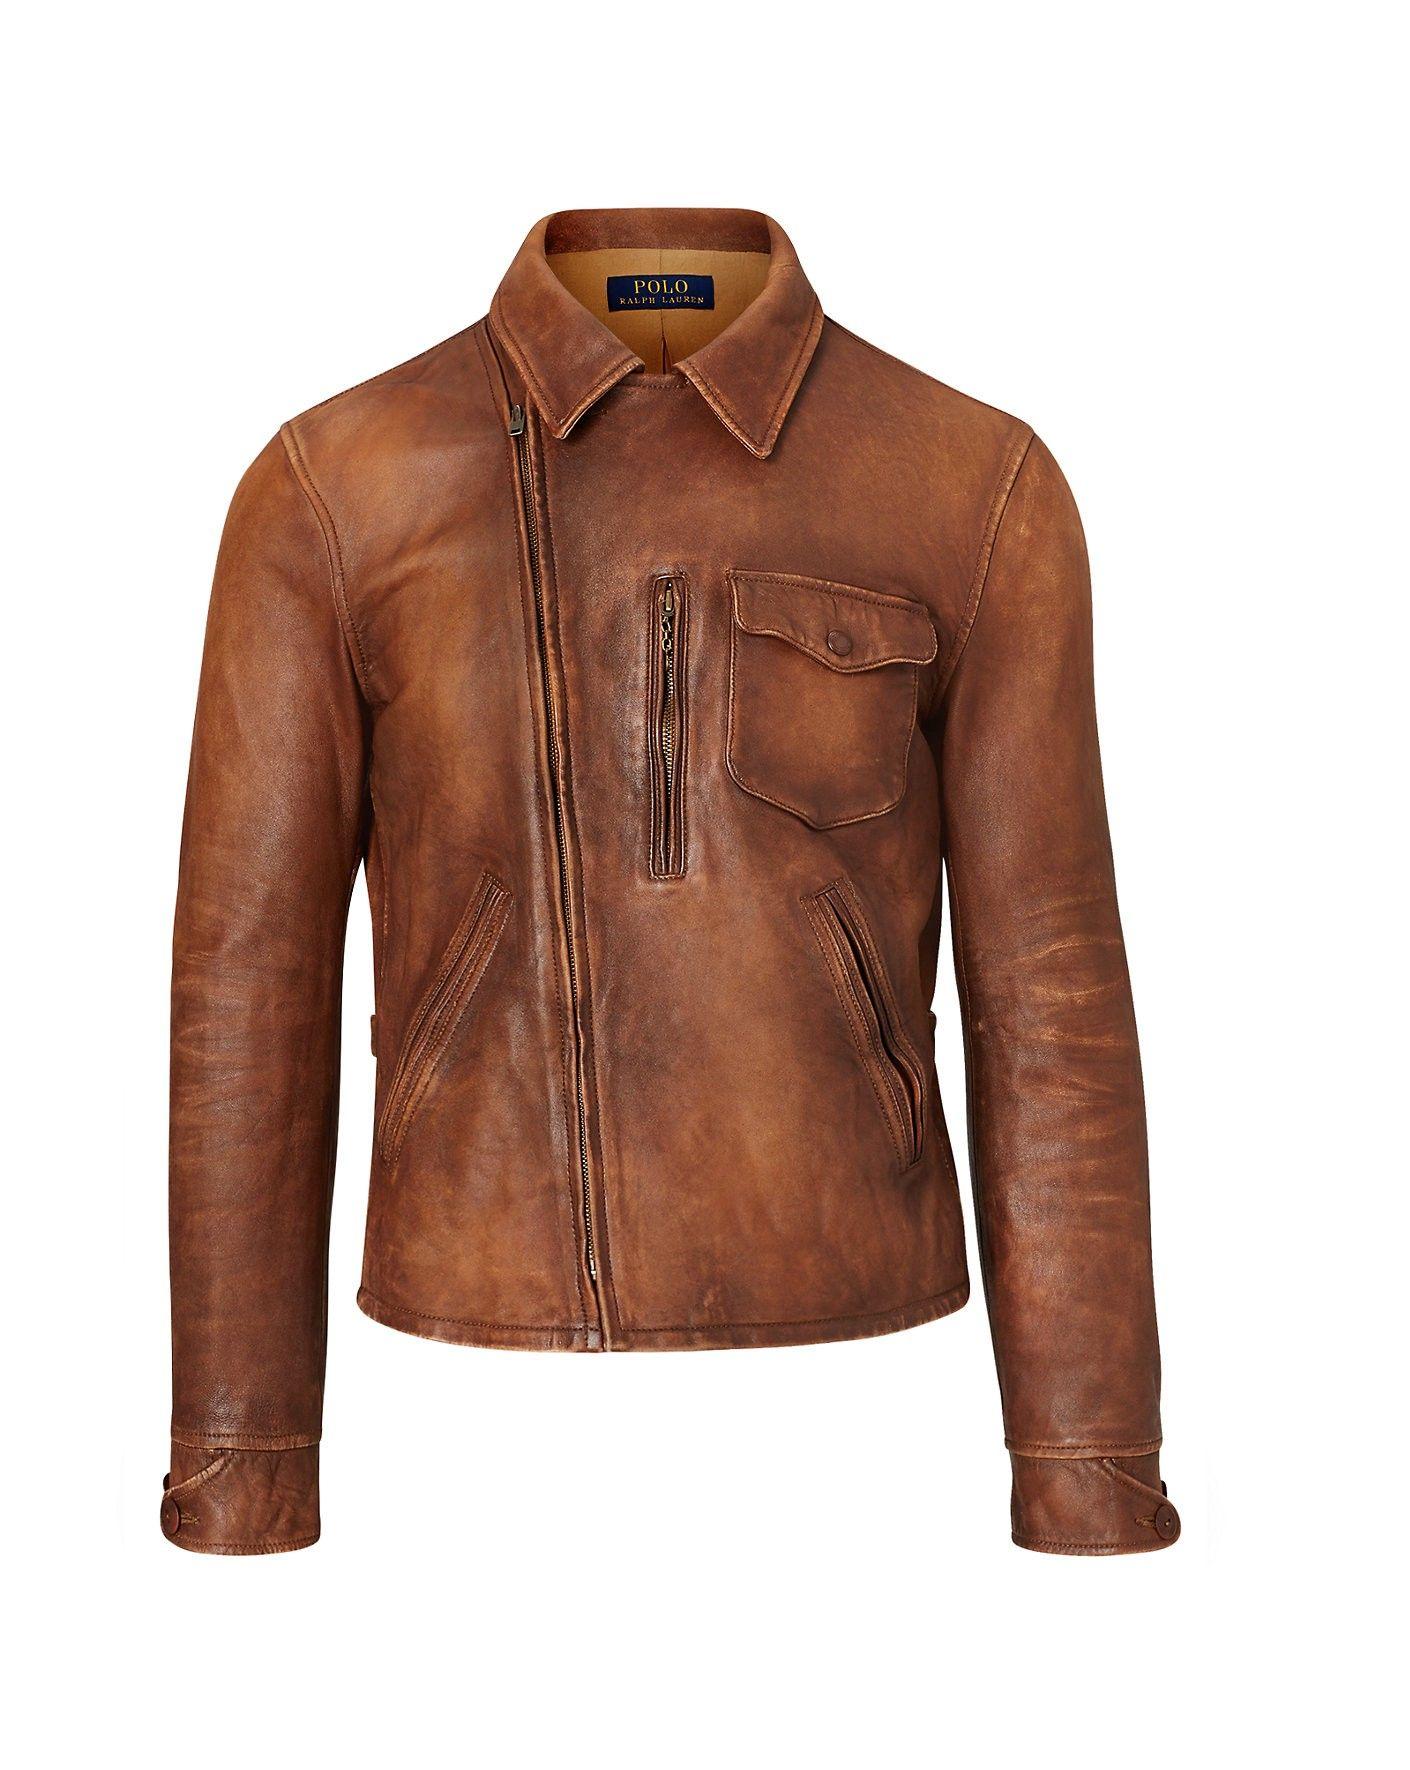 Polo Ralph Lauren Lambskin Jacket Poloralphlauren Cloth All Polo Leather Jacket Leather Jacket Lambskin Jacket [ 1770 x 1410 Pixel ]